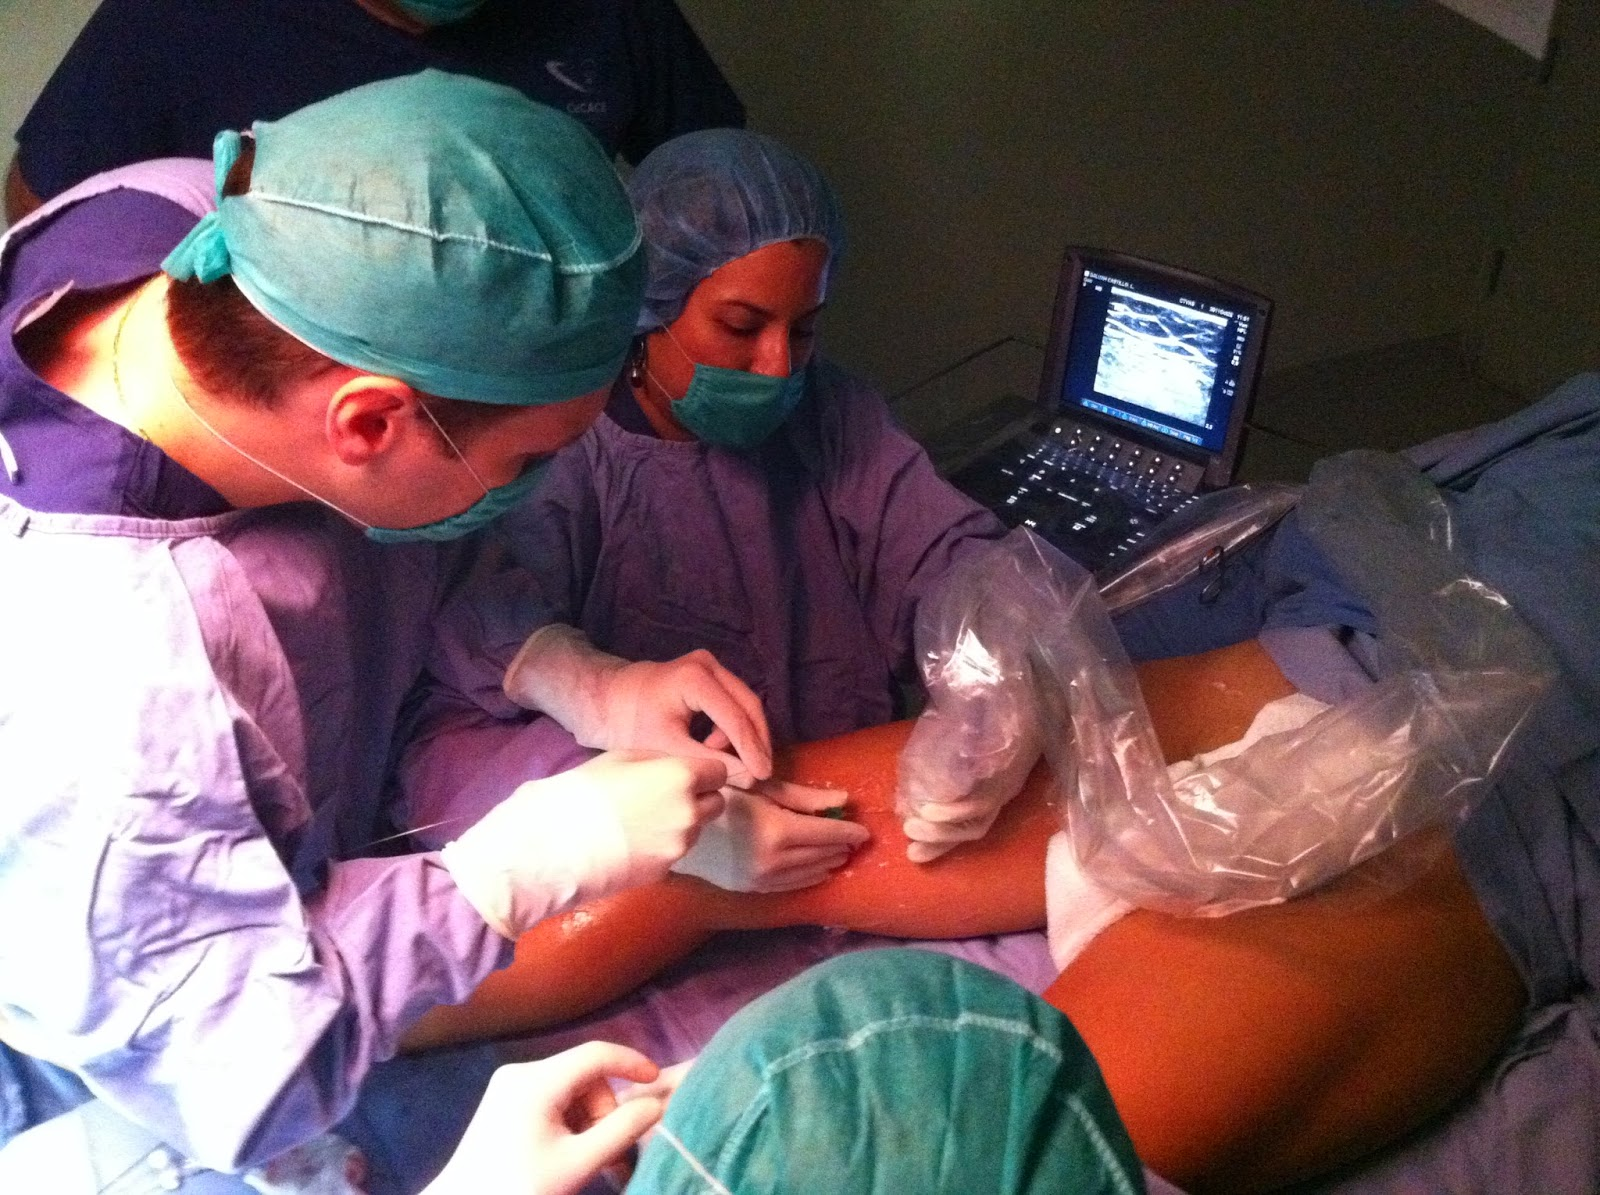 O ultra-som doppler pode ser utilizado para quiar a cirurgia a laser para varizes